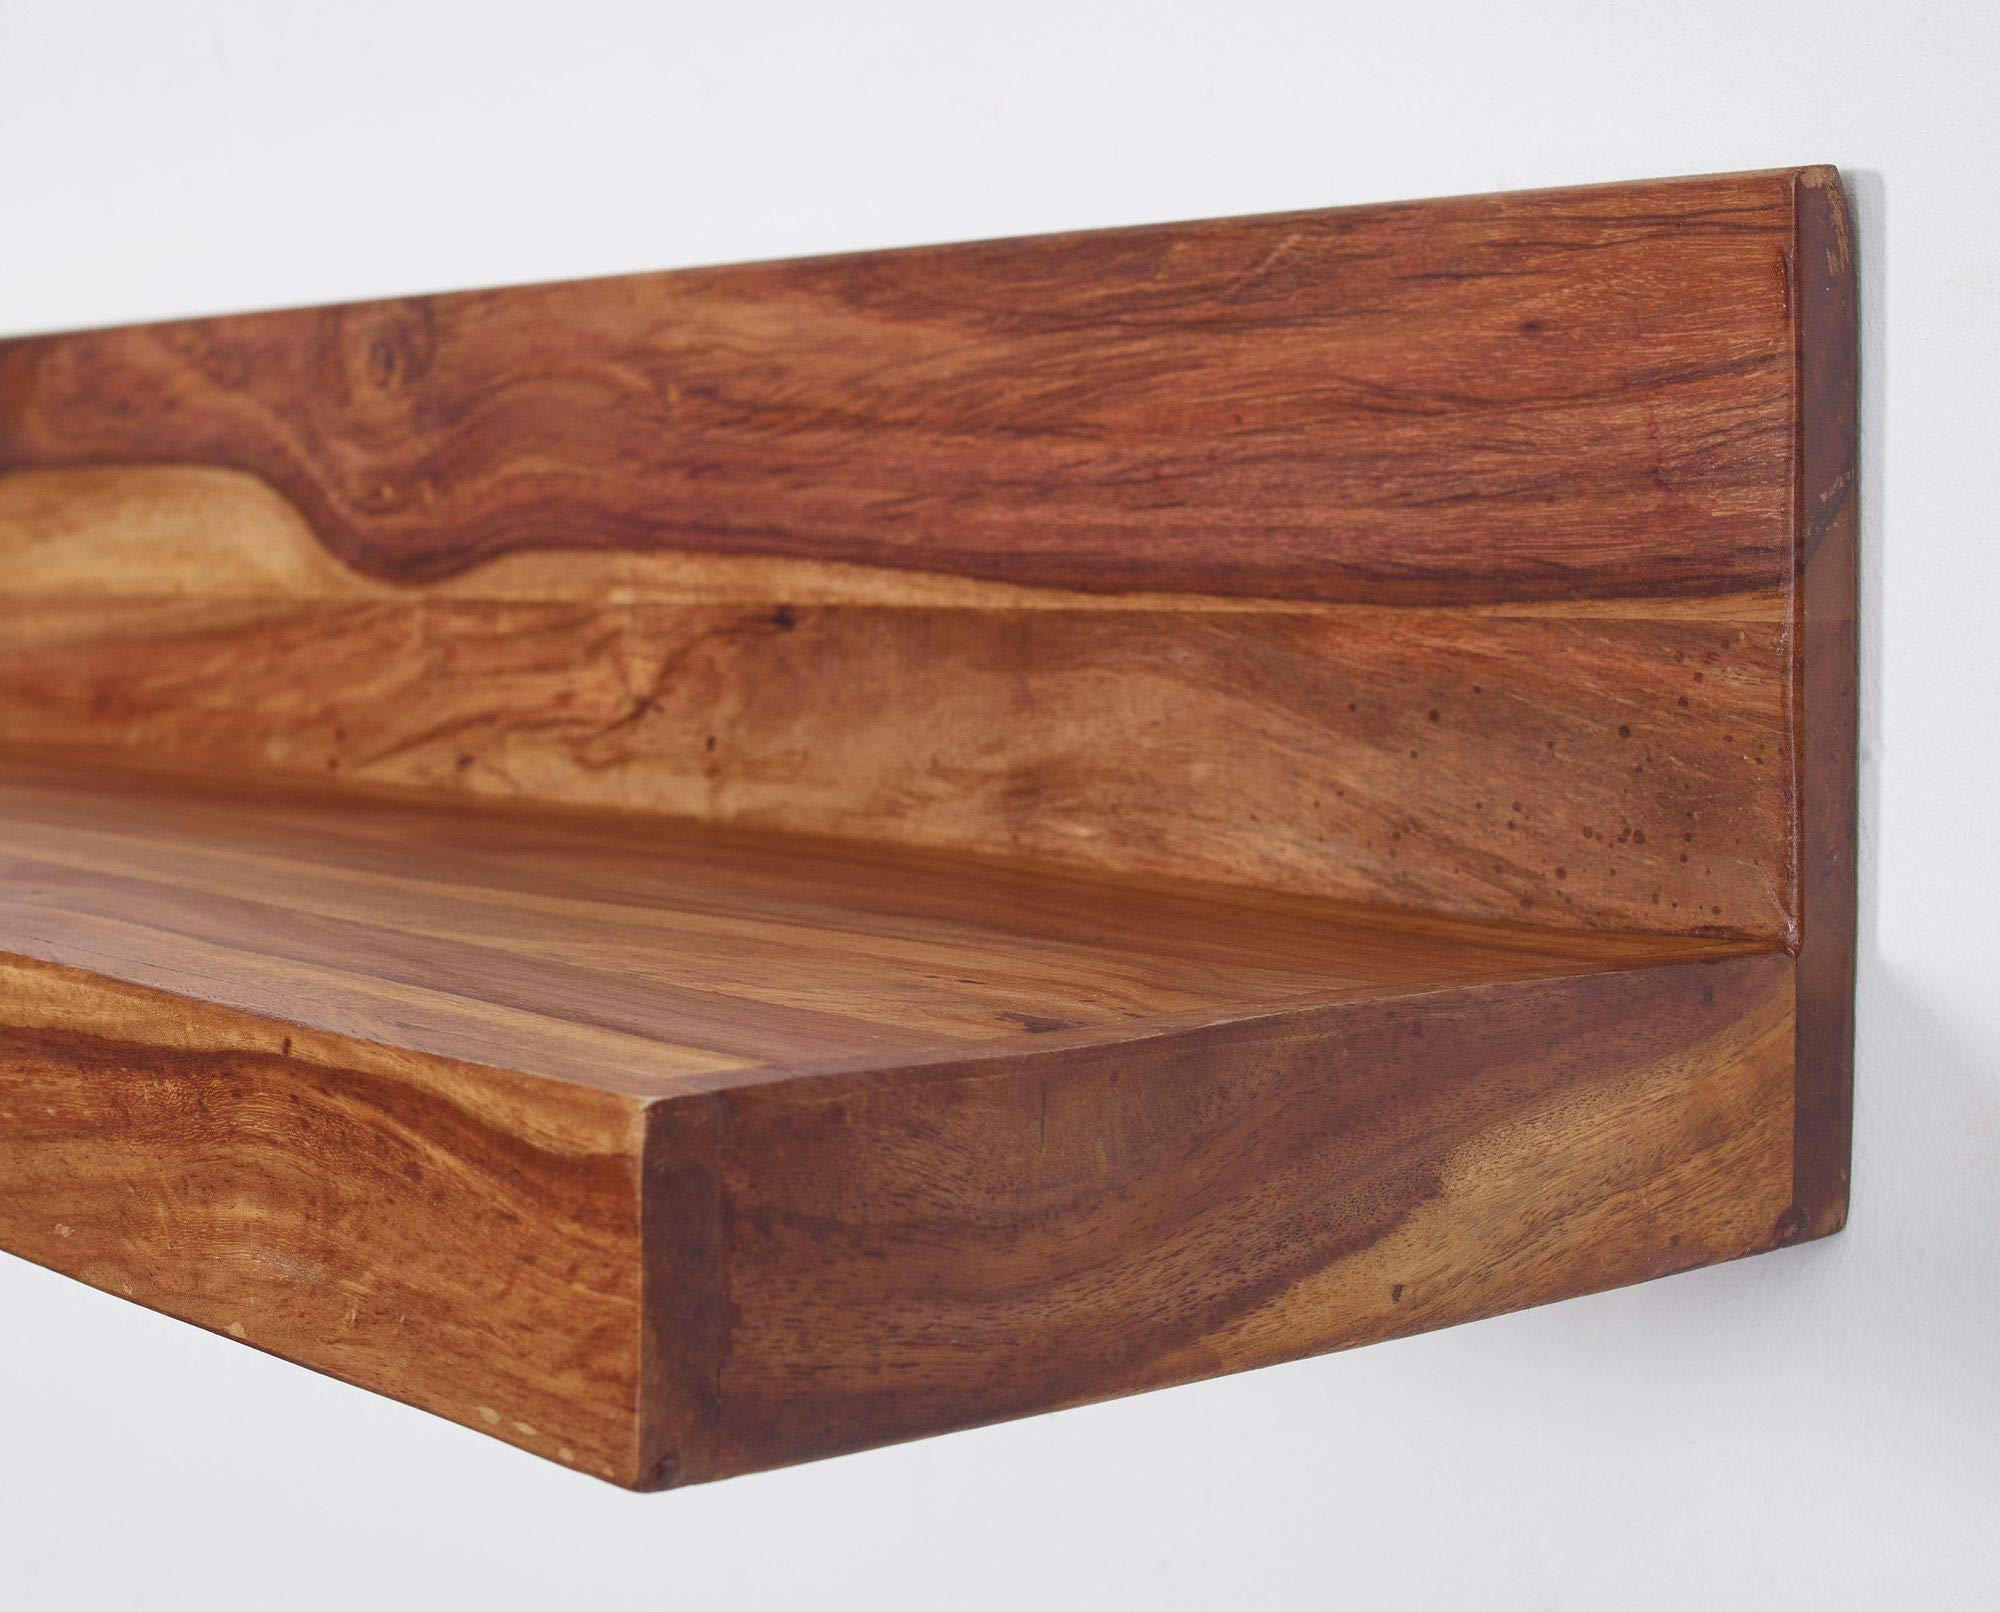 Finebuy Wandregal Massiv Holz Sheesham Holzregal 160 Cm Breit